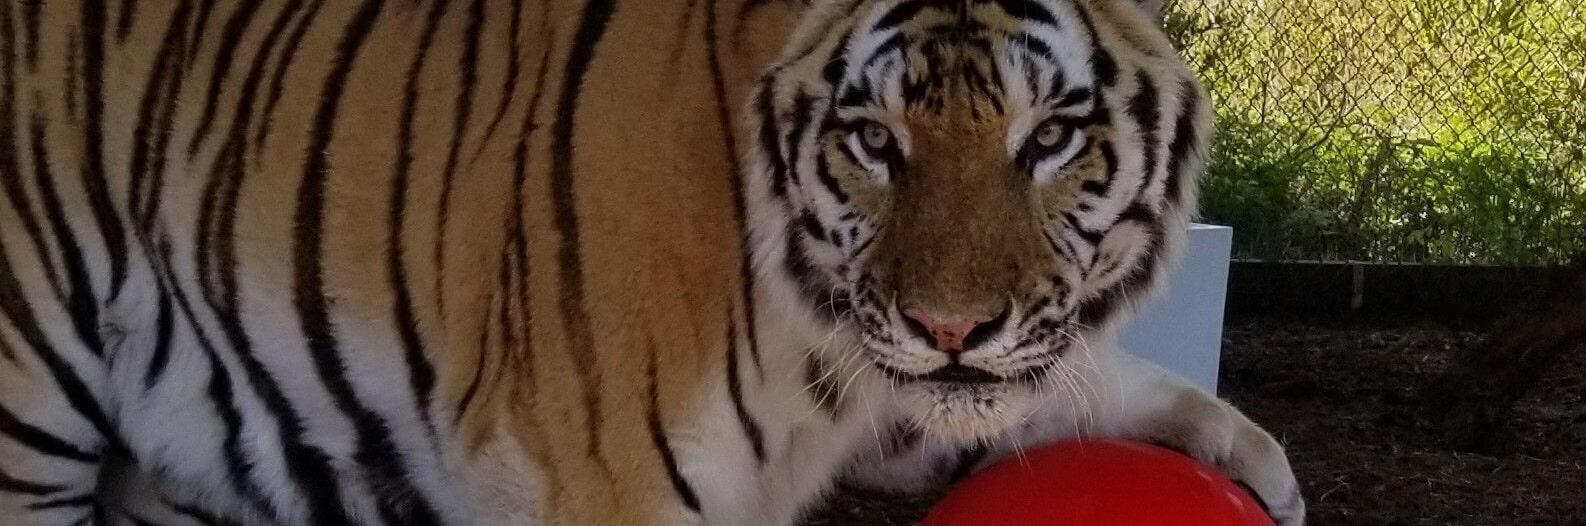 Bengal Tiger - Central Florida Animal Reserve